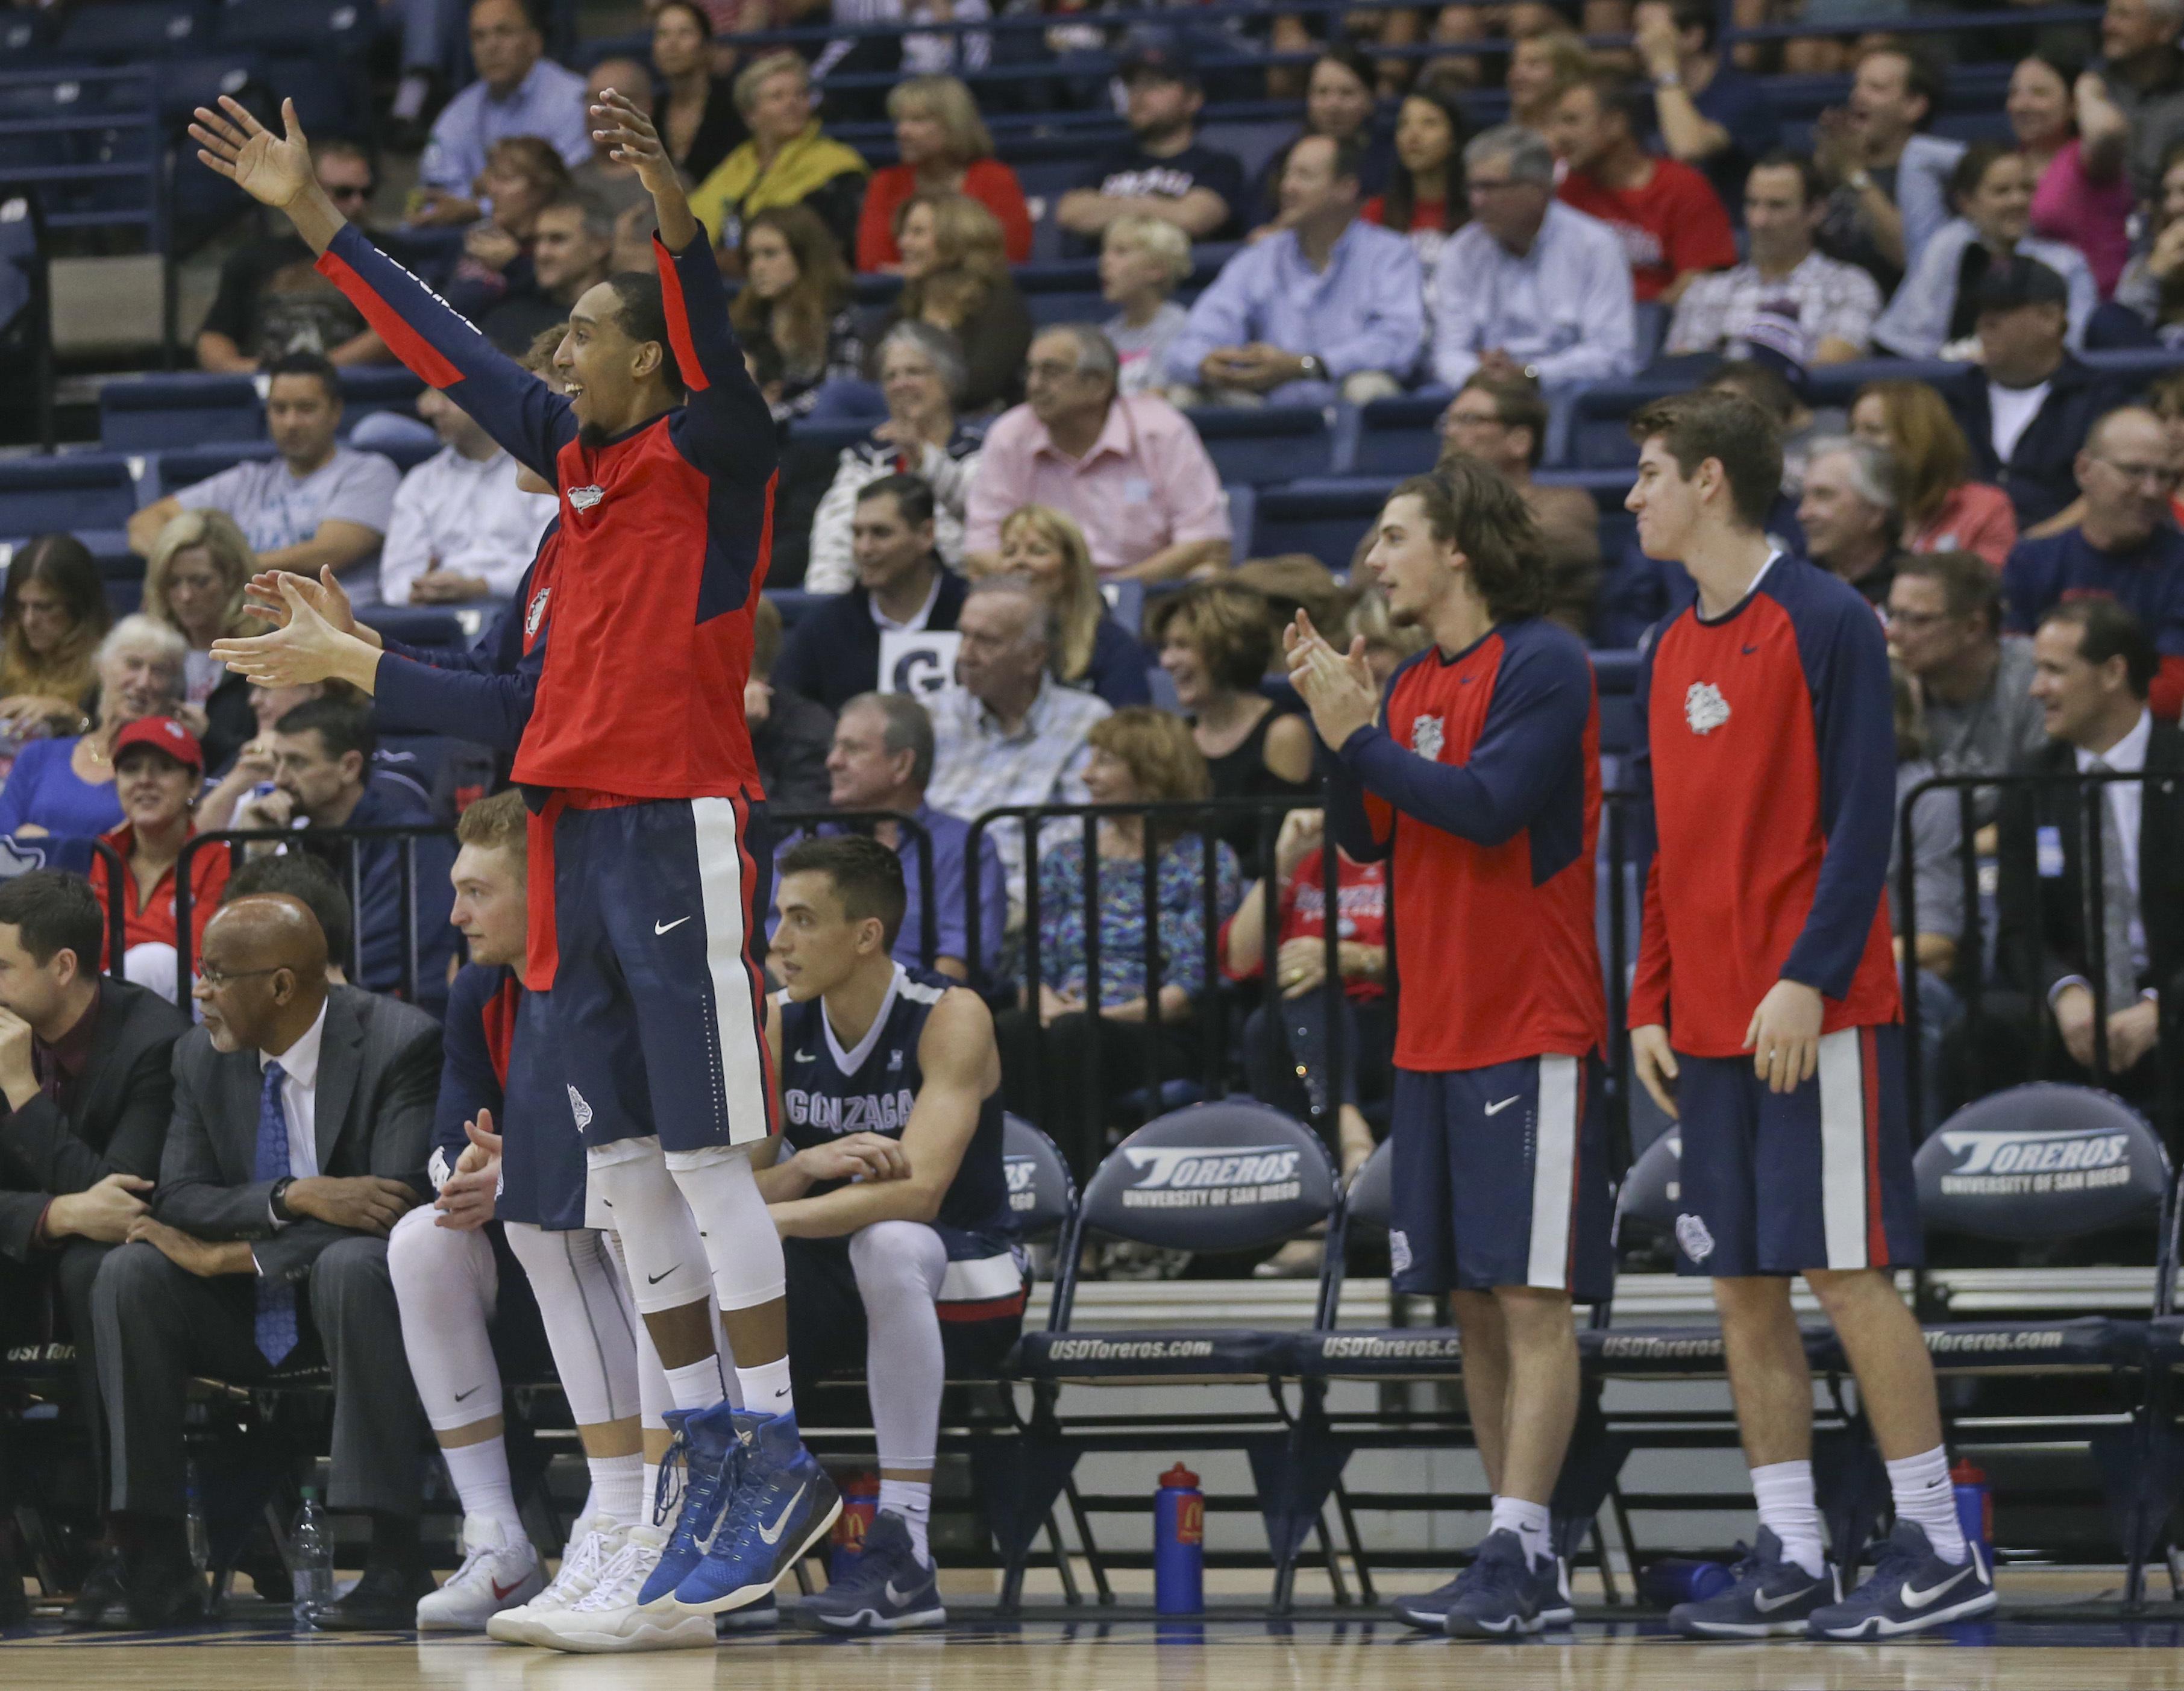 The Gonzaga bench celebrates a 3-point basket against San Diego during the second half of an NCAA college basketball game Thursday, Feb. 25, 2016, in San Diego. Gonzaga won 82-60.(AP Photo/Lenny Ignelzi)